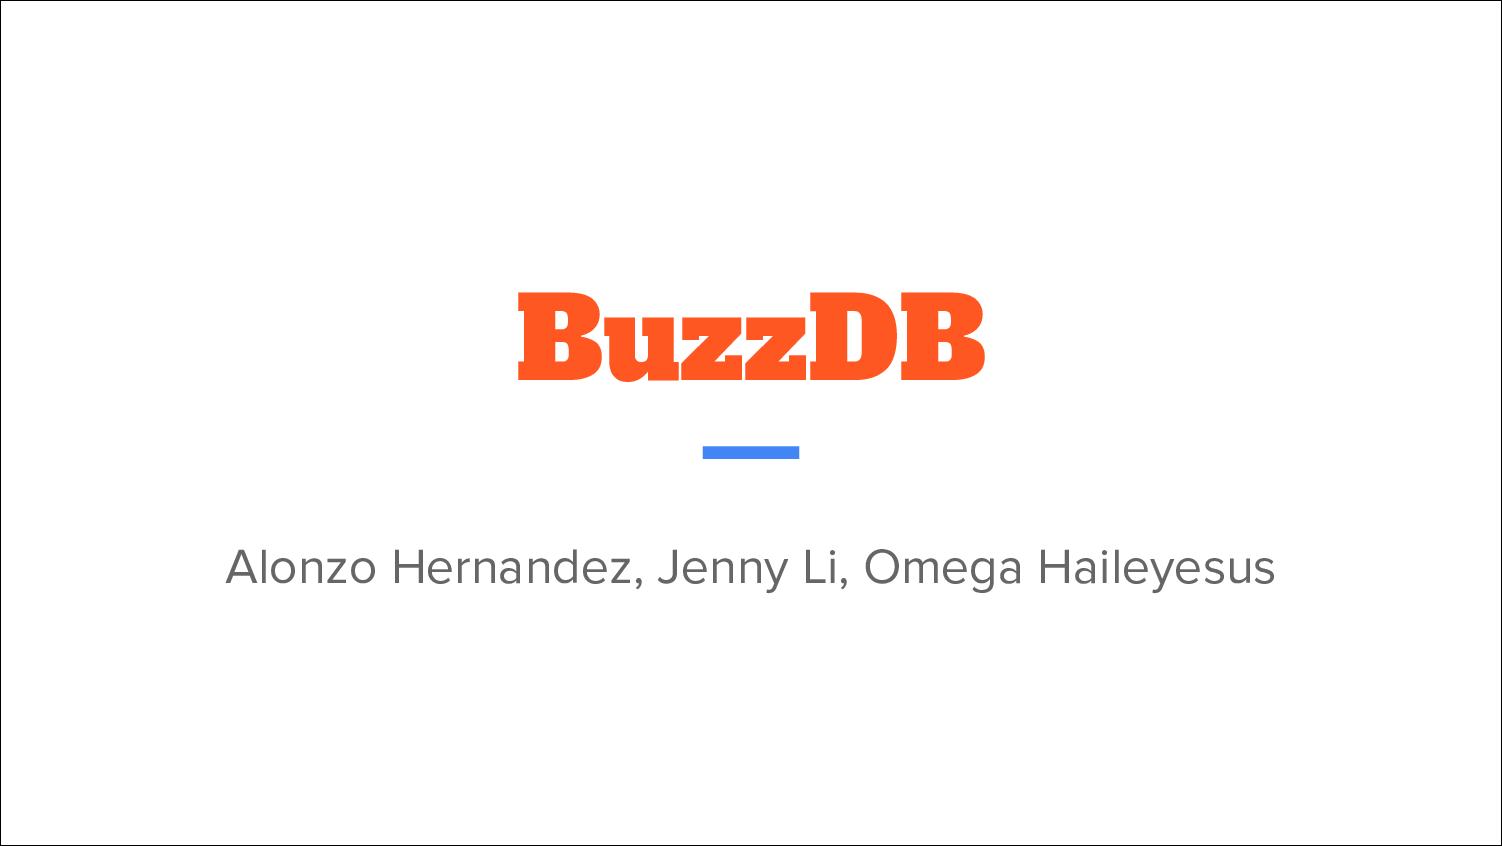 [PRESENTATION] BuzzDB (II)